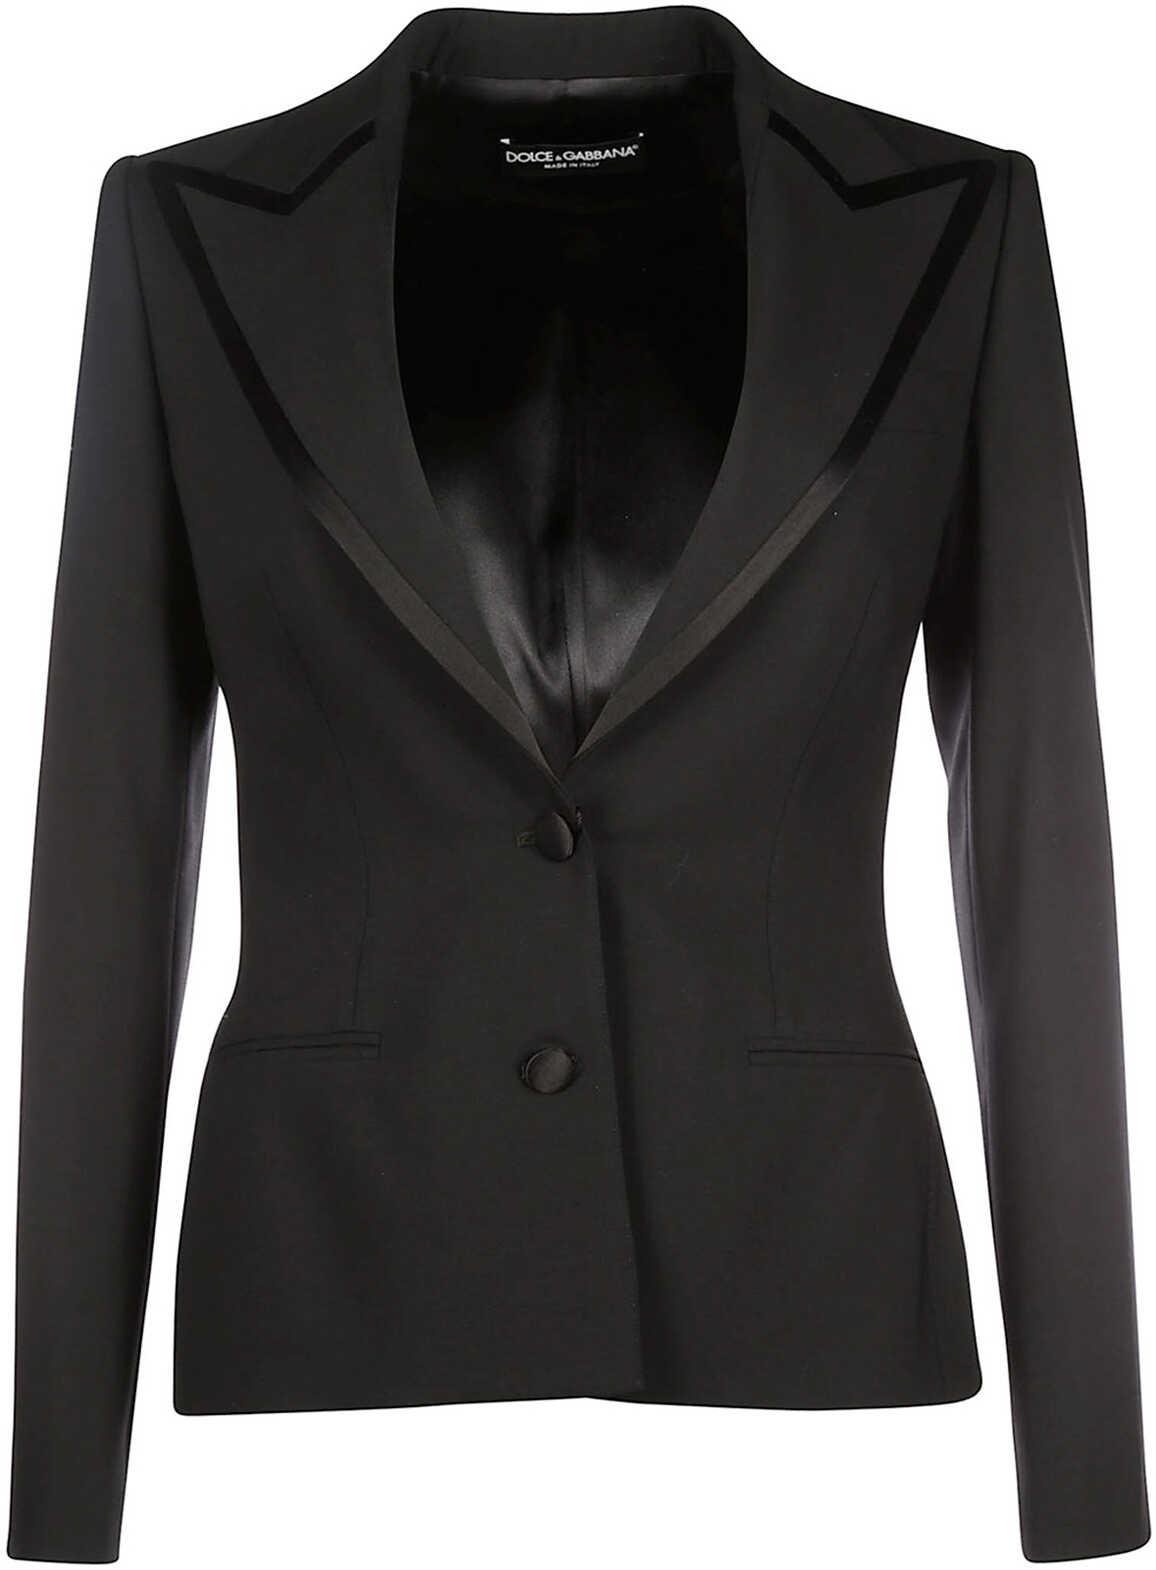 Dolce & Gabbana Jacket Blazer Black